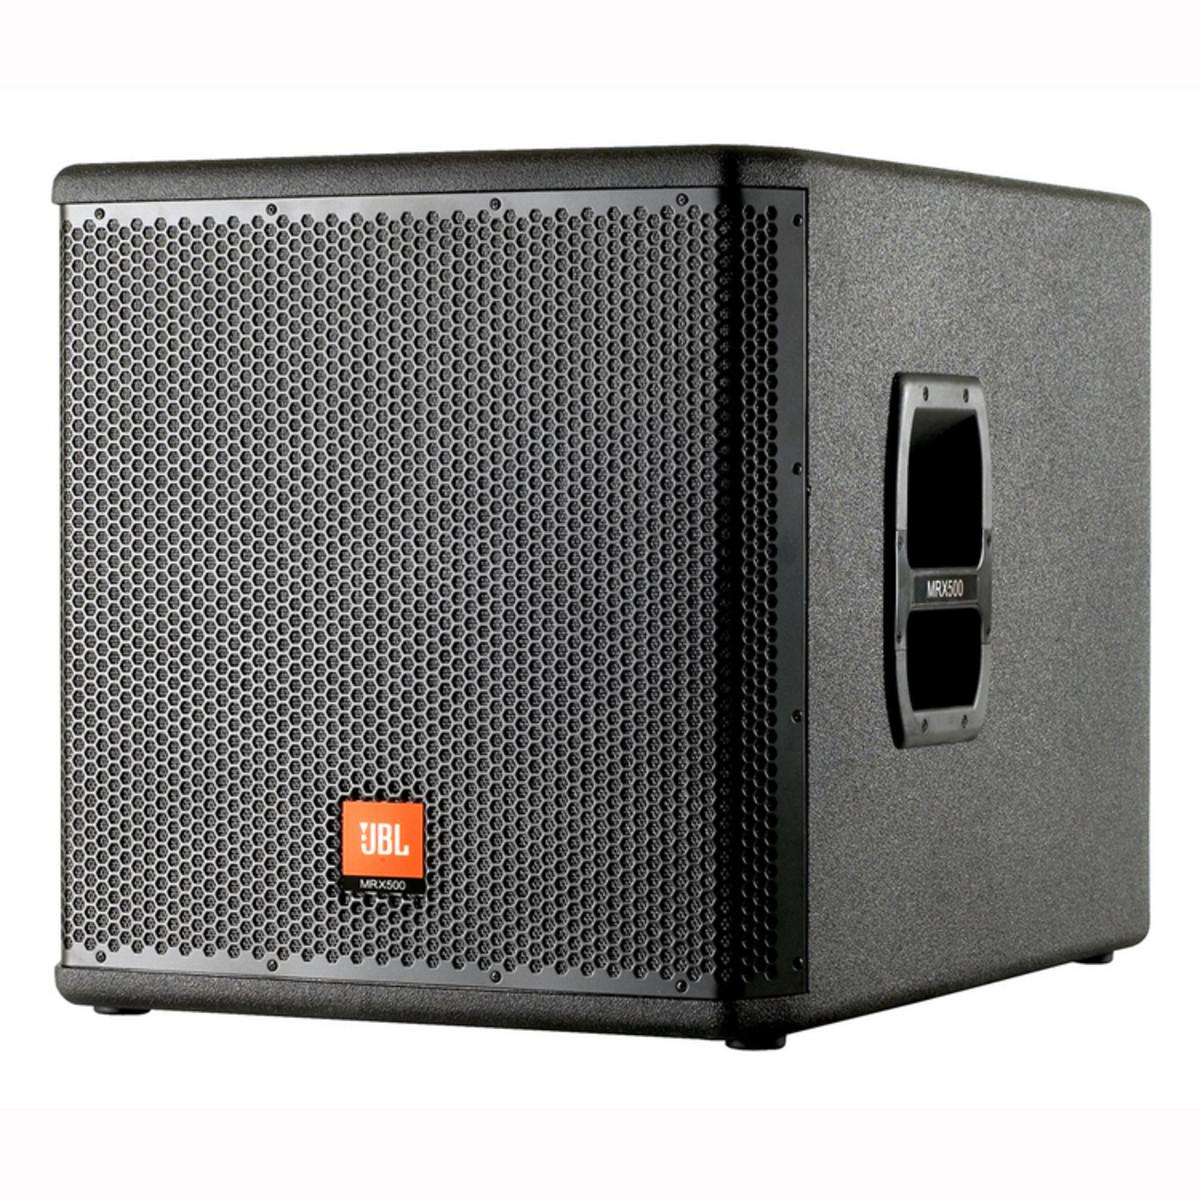 jbl mrx518s 18 caisson de basse. Black Bedroom Furniture Sets. Home Design Ideas